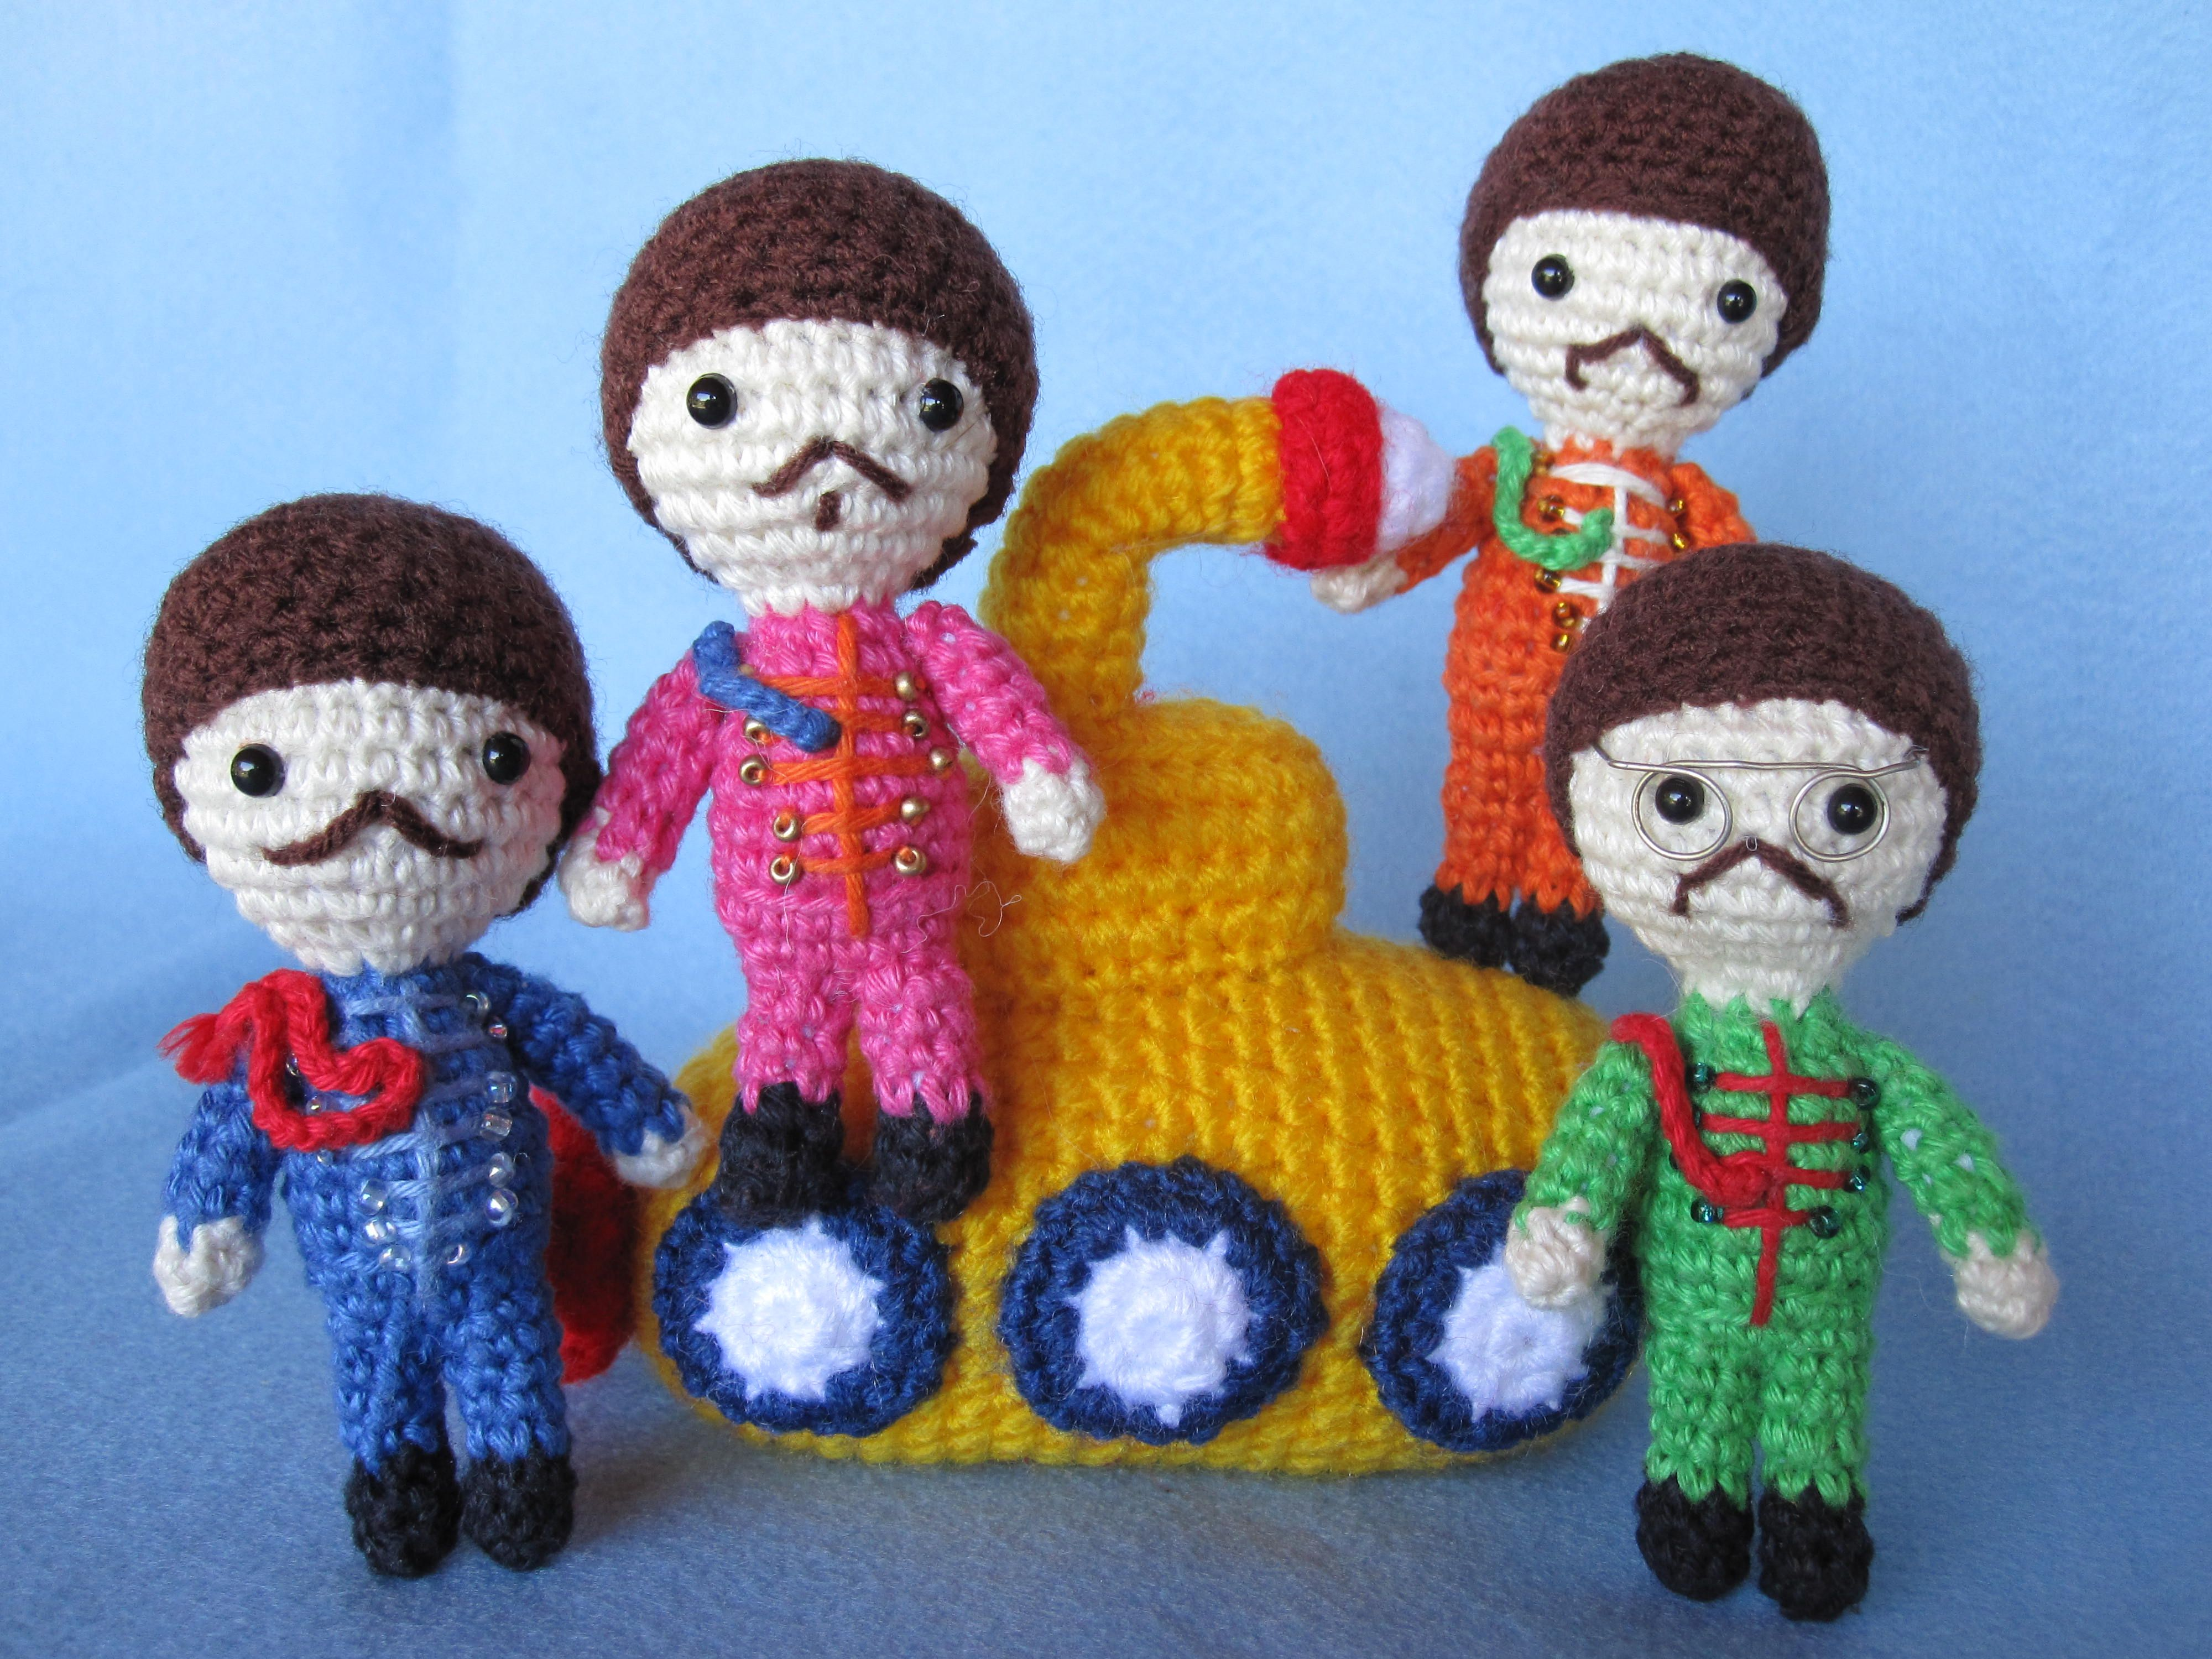 Amigurumi Learn : Crochet beatles great inspiration i will learn how to crochet